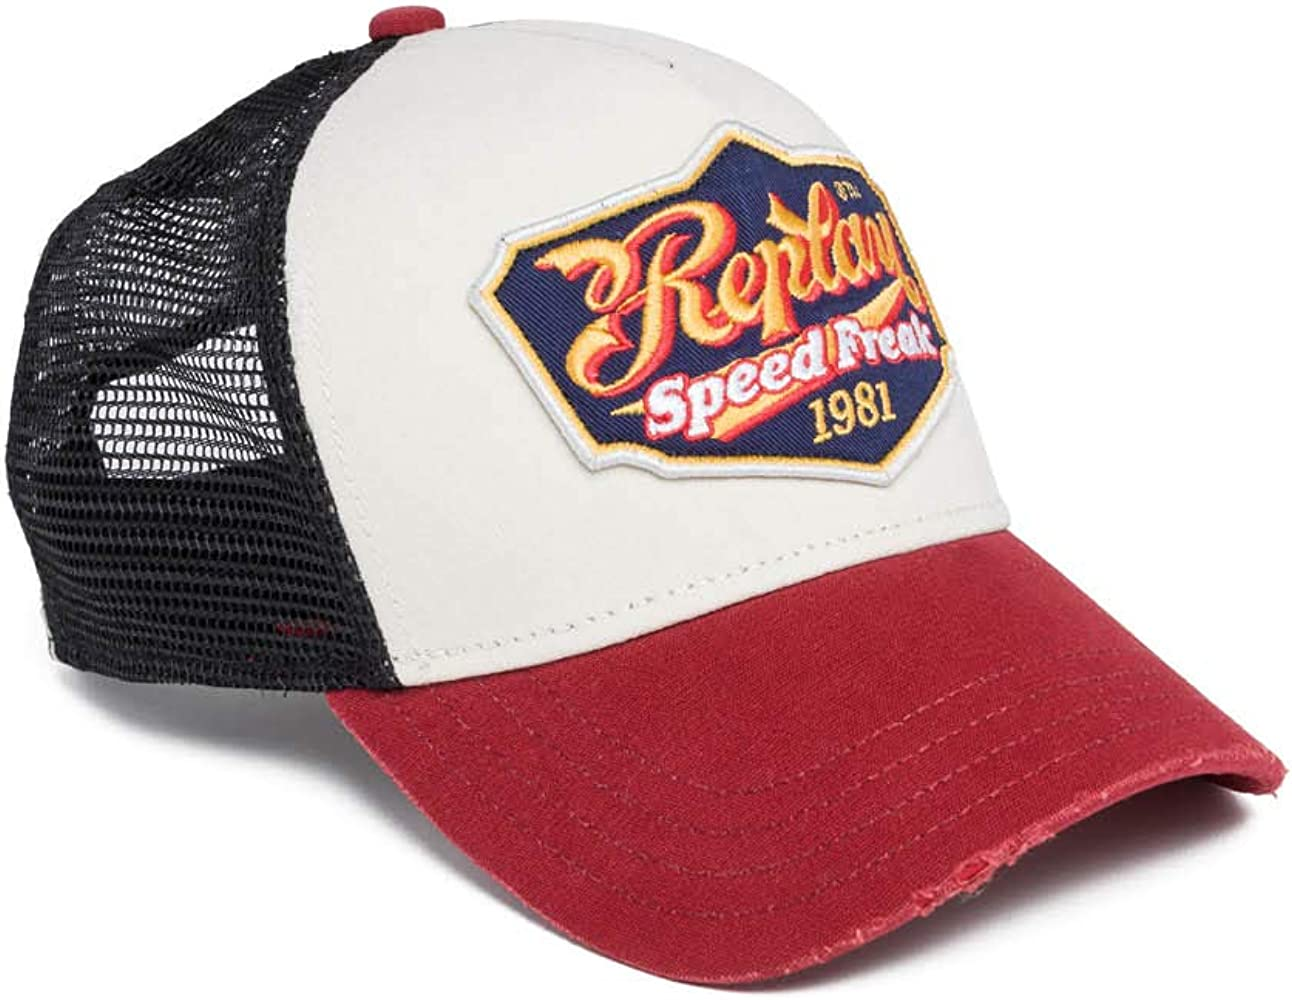 REPLAY Am4203.000.a0387 Gorra de béisbol, Multicolor (Red+Blck+Old ...